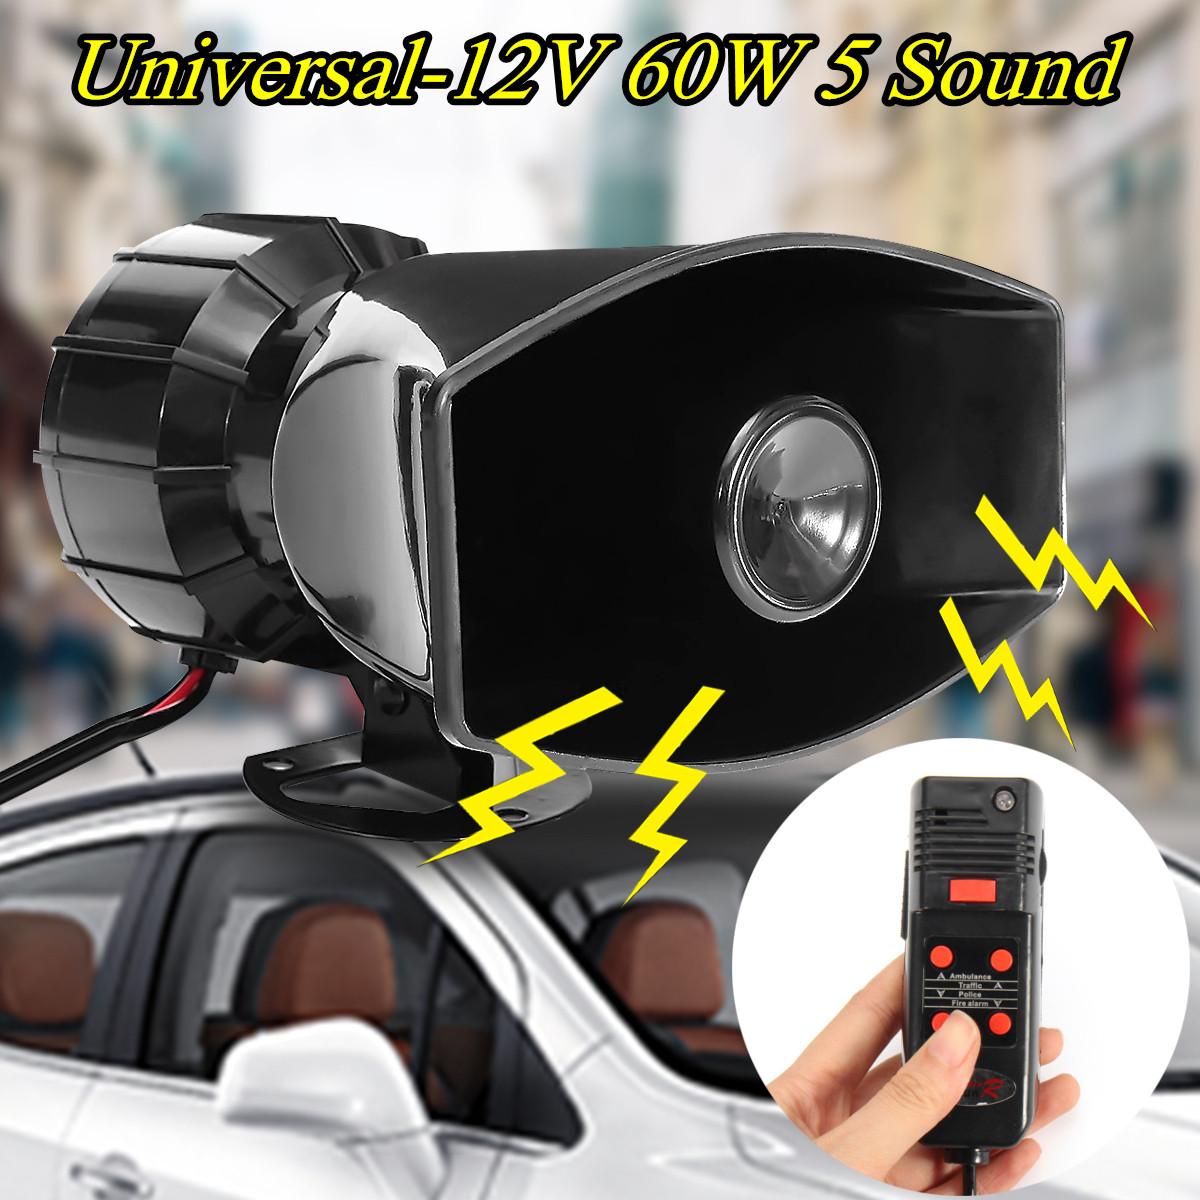 60W 5 Sound Loud Car Warning Alarm Police Fire Siren Horn PA Speaker MIC System